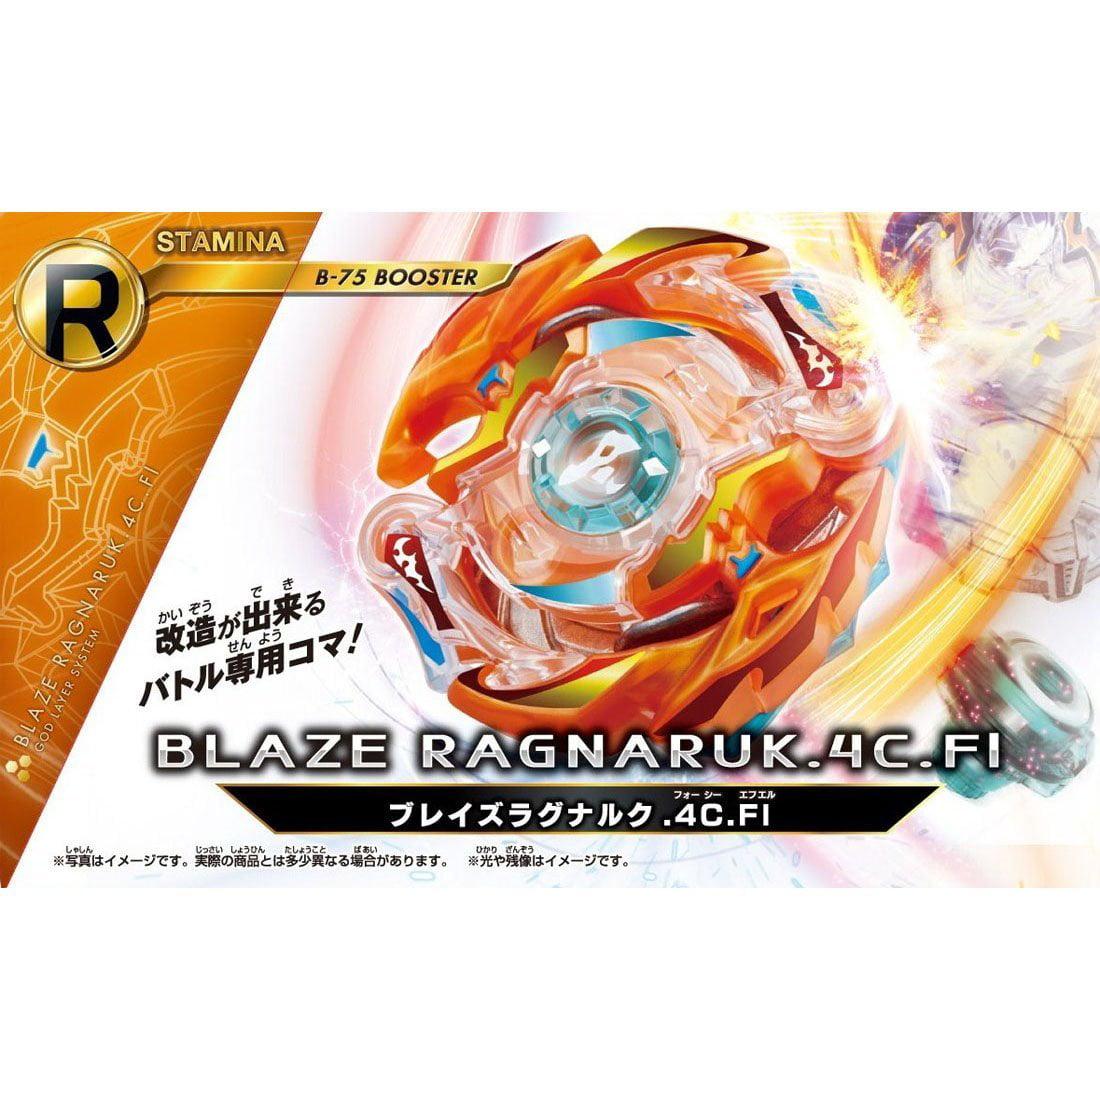 Burst B-75 Booster Blaze Ragnaruk .4C.Fl